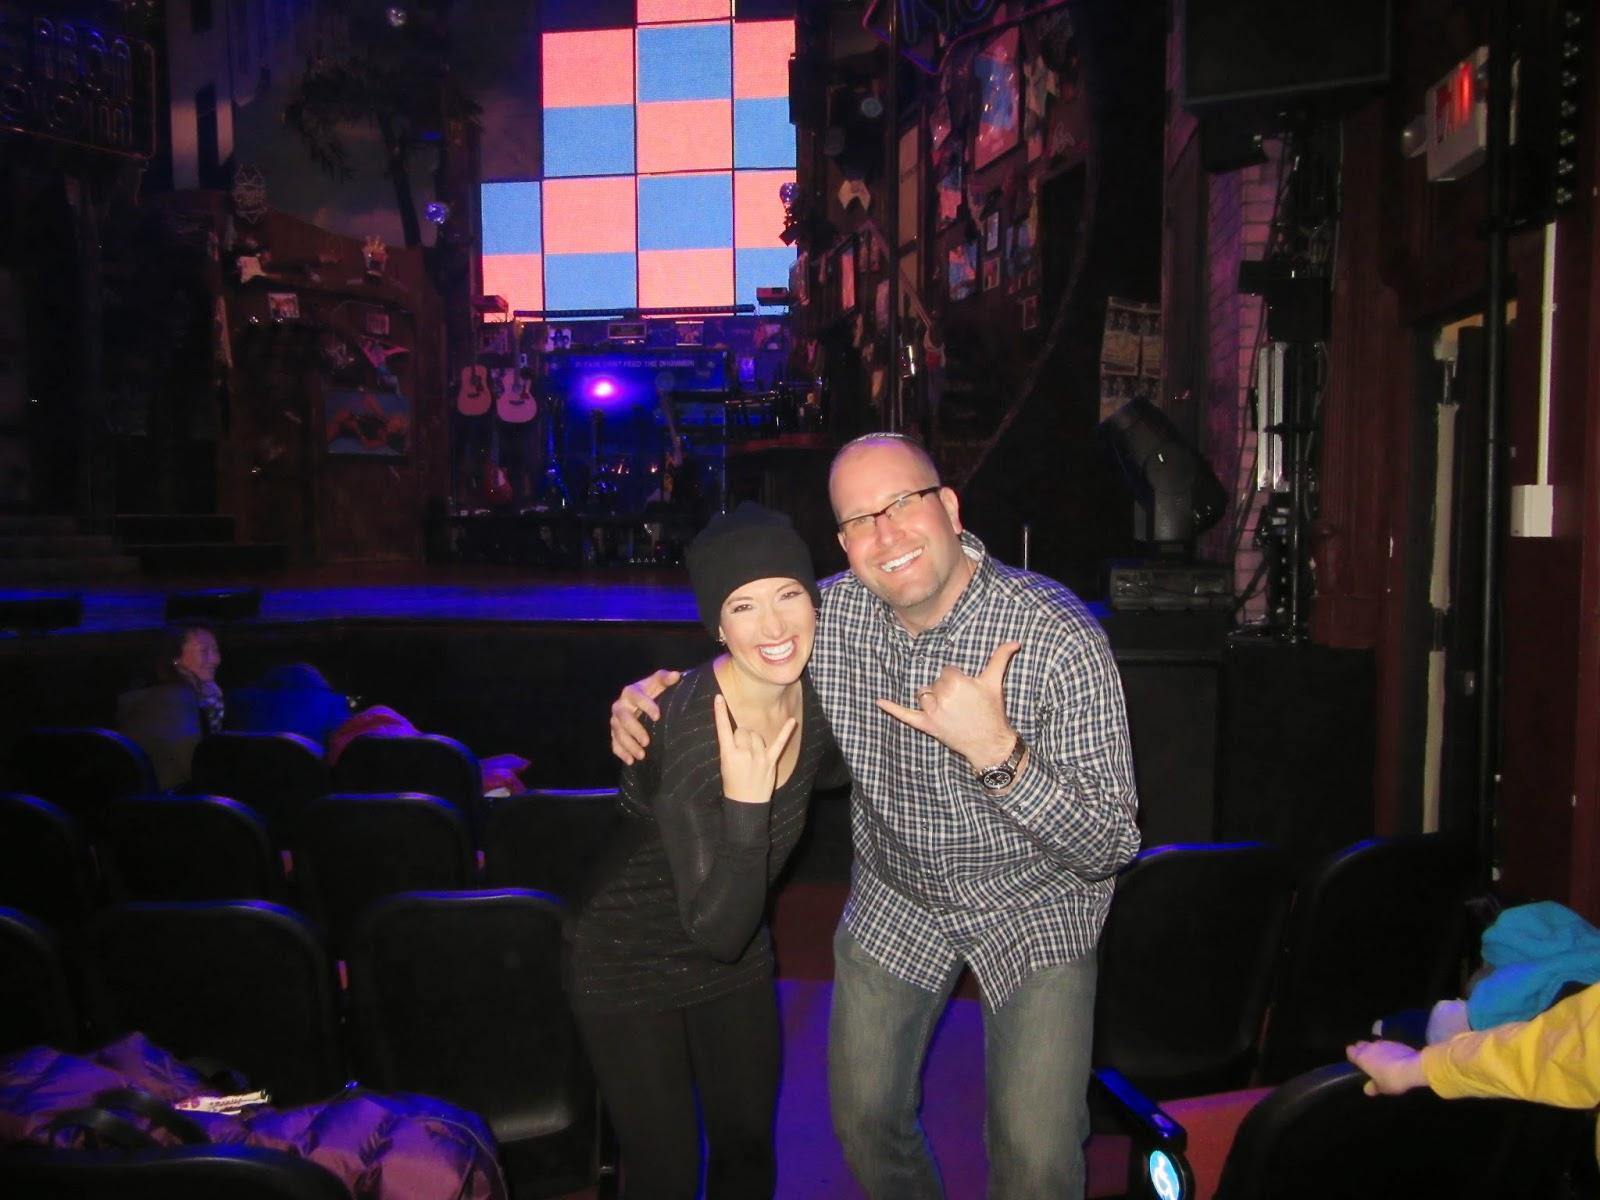 Randi Zuckerberg in Rock of Ages on Broadway with Rabbi Jason